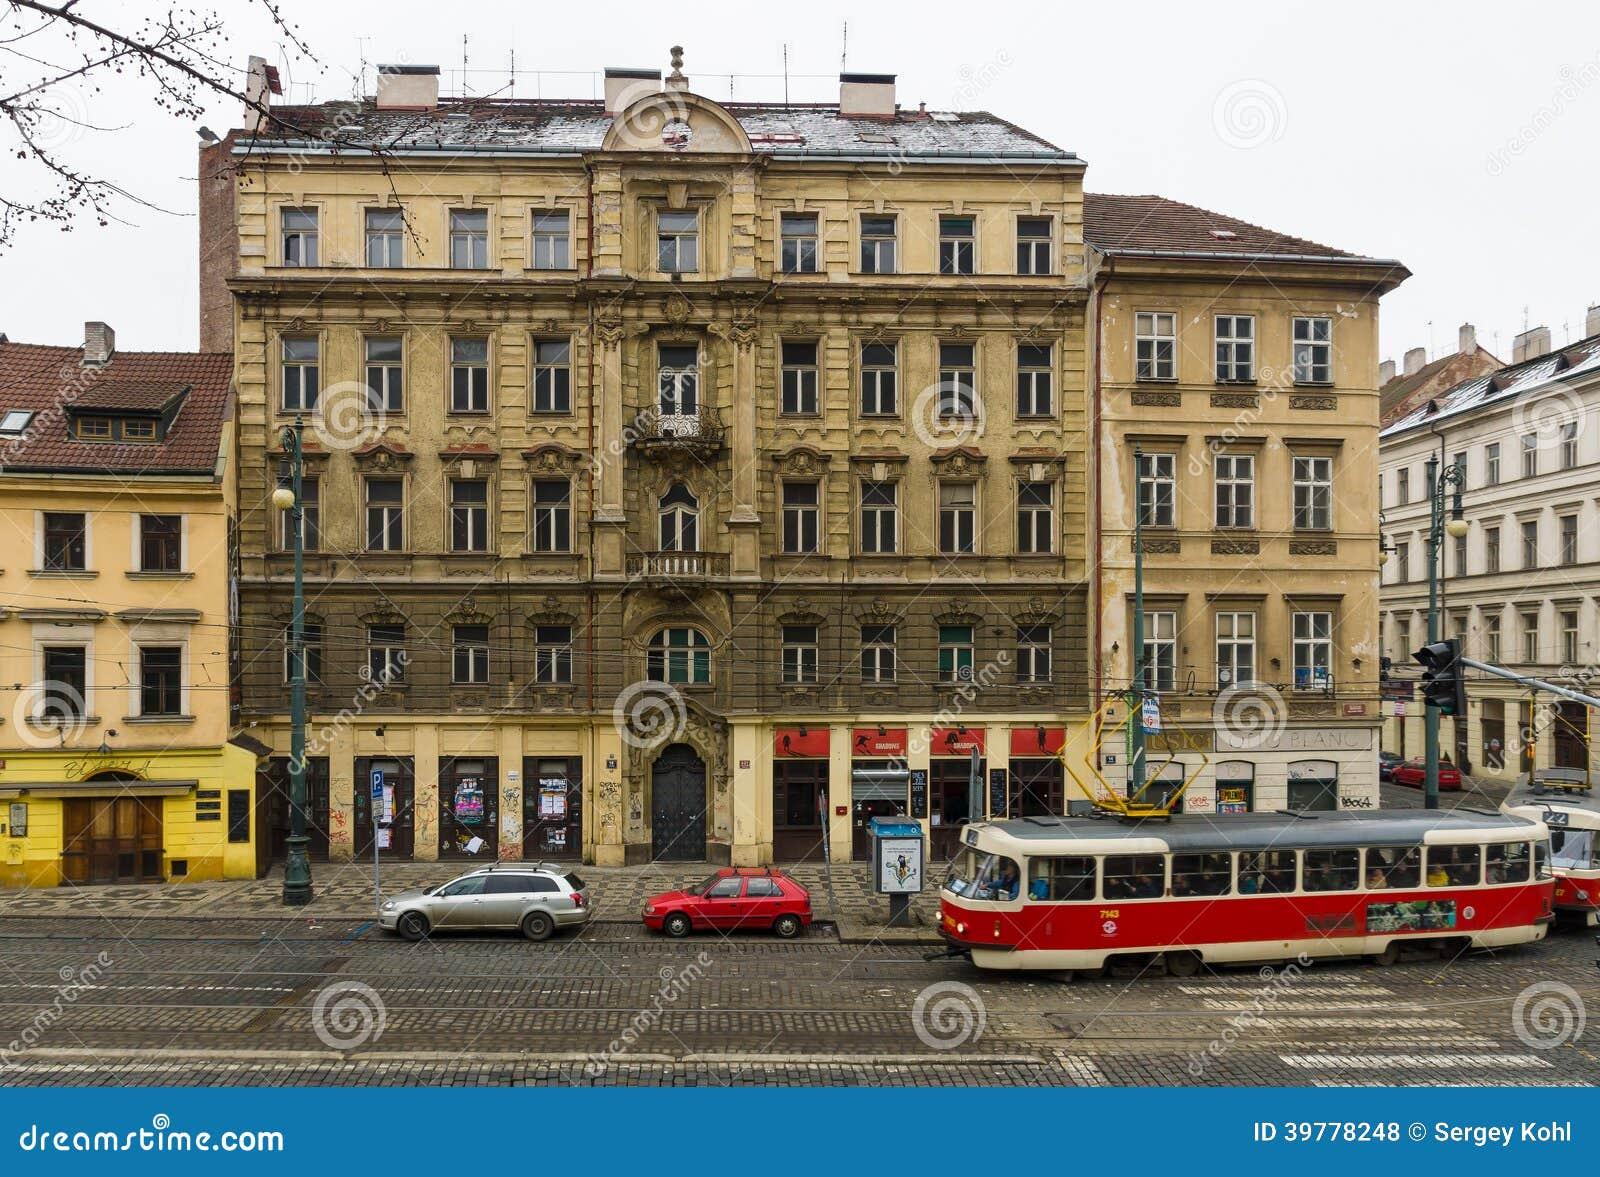 old tram prague street - photo #47